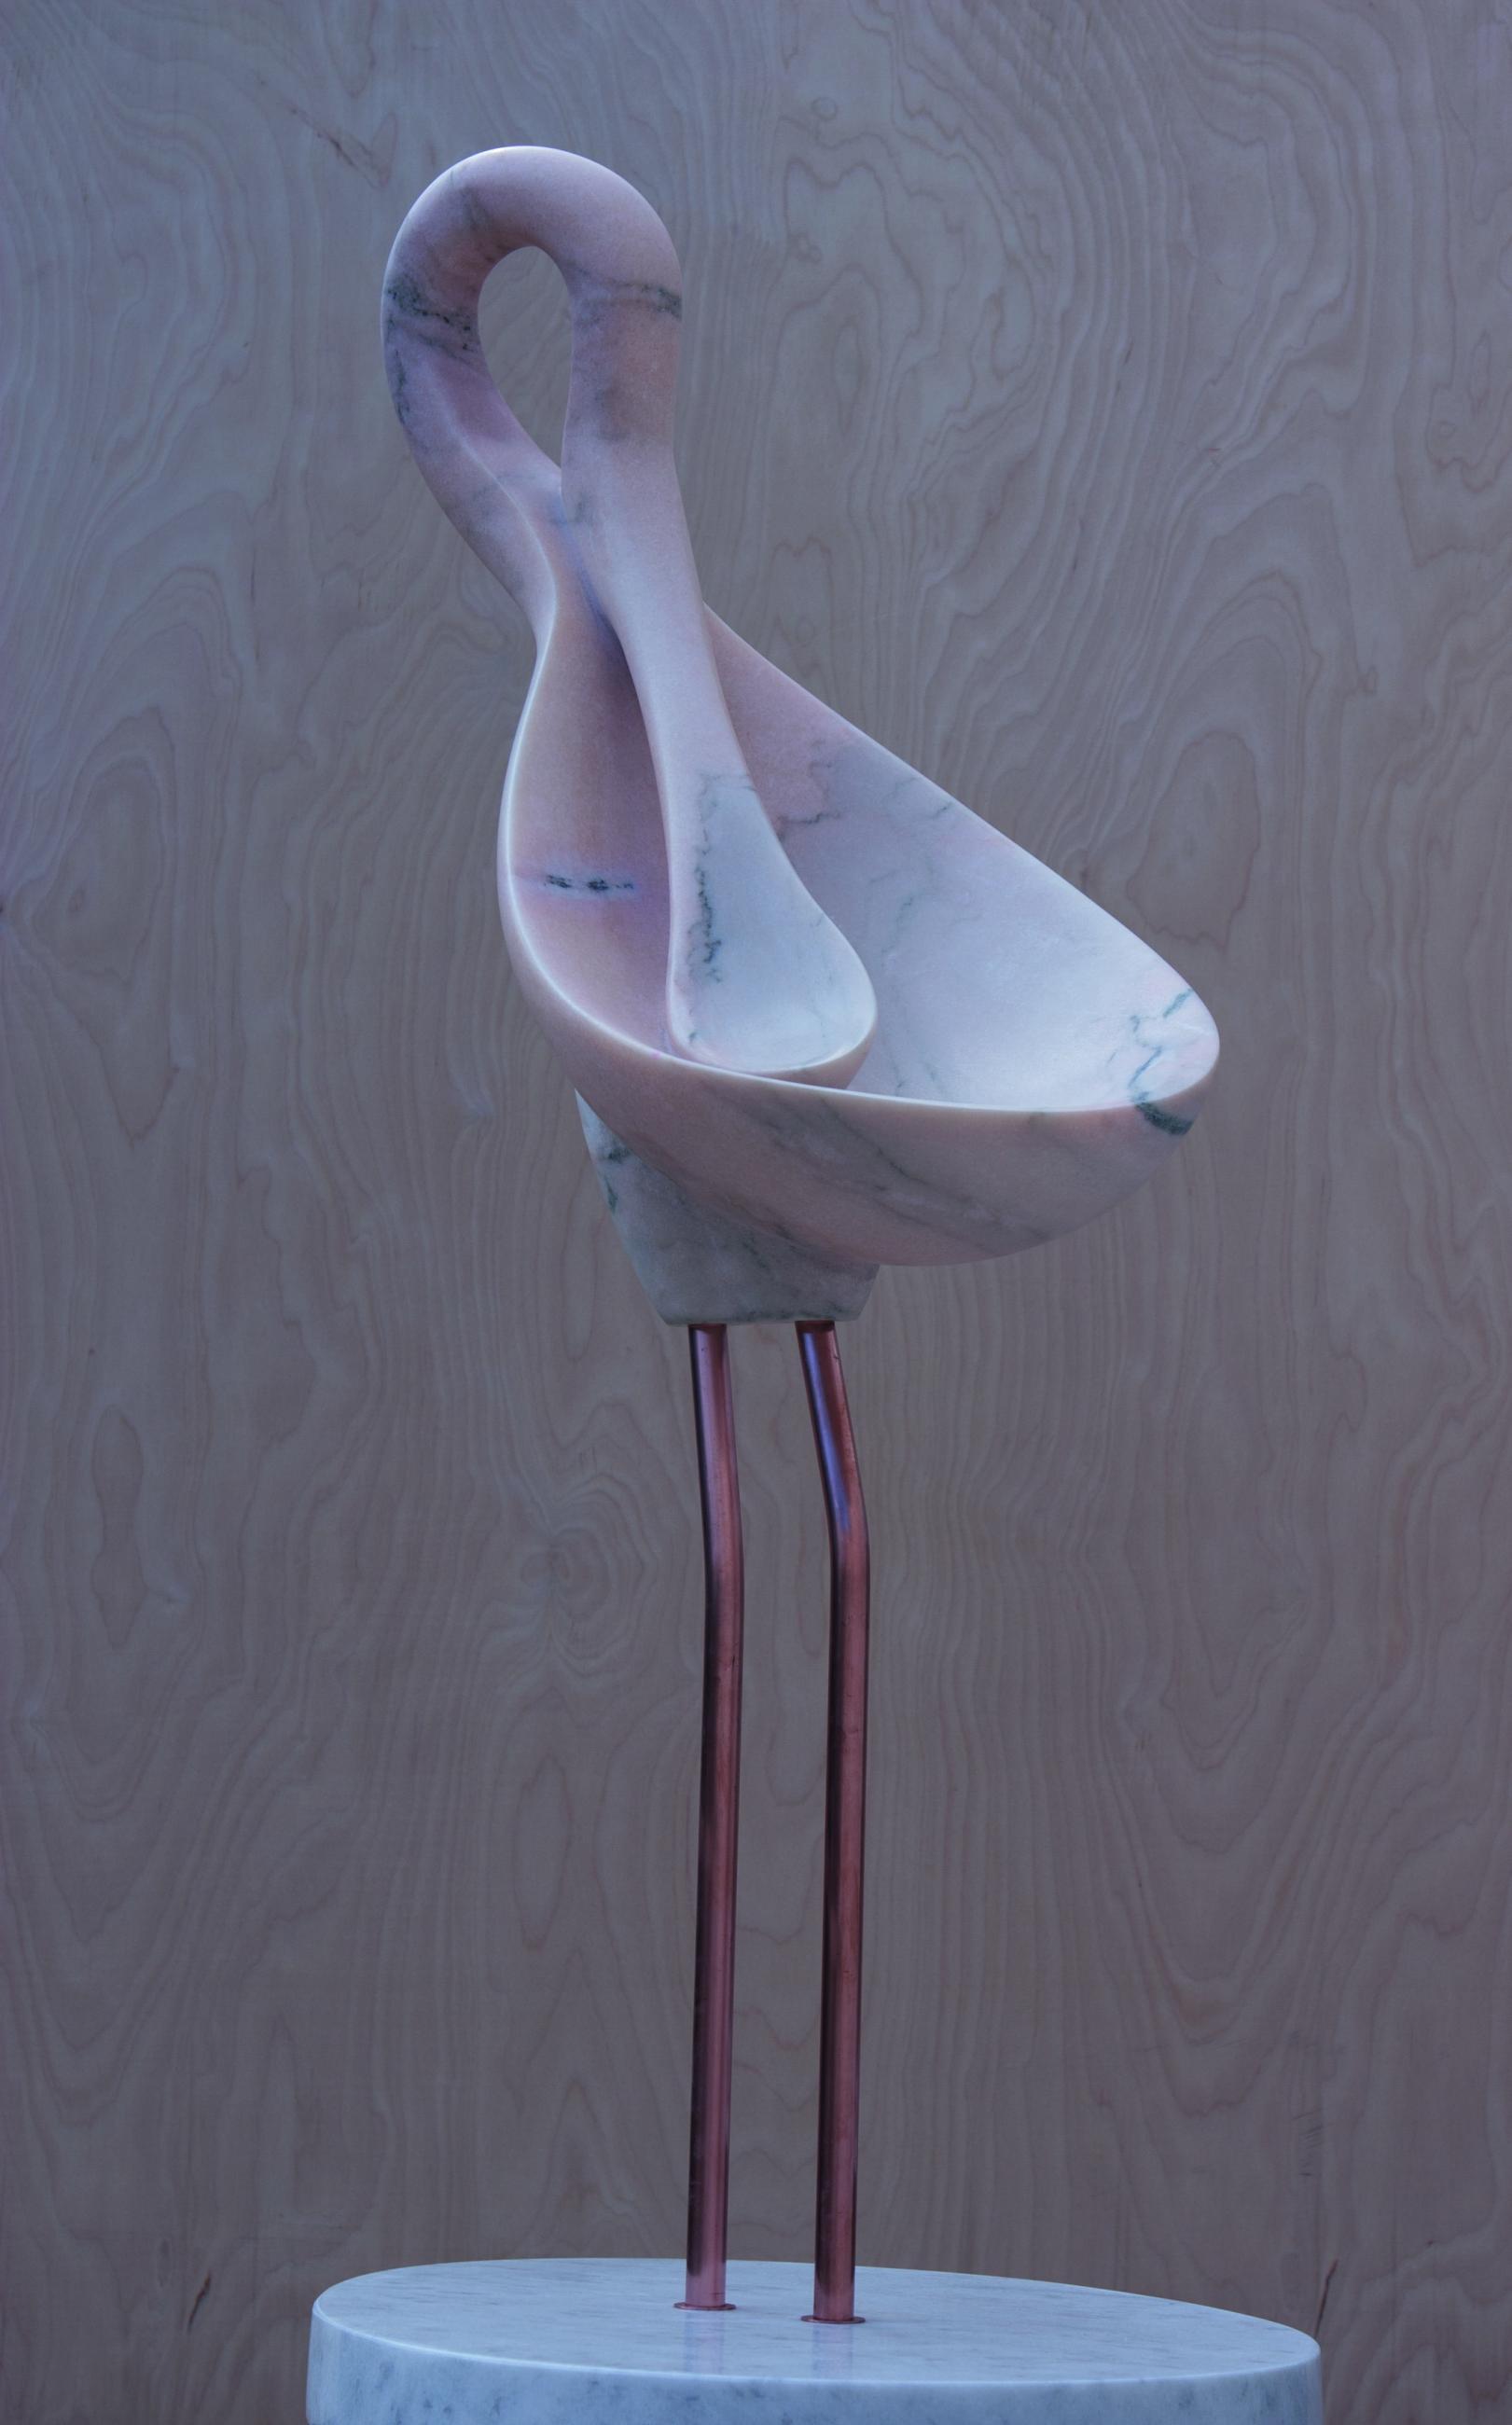 Spoonbill roseate